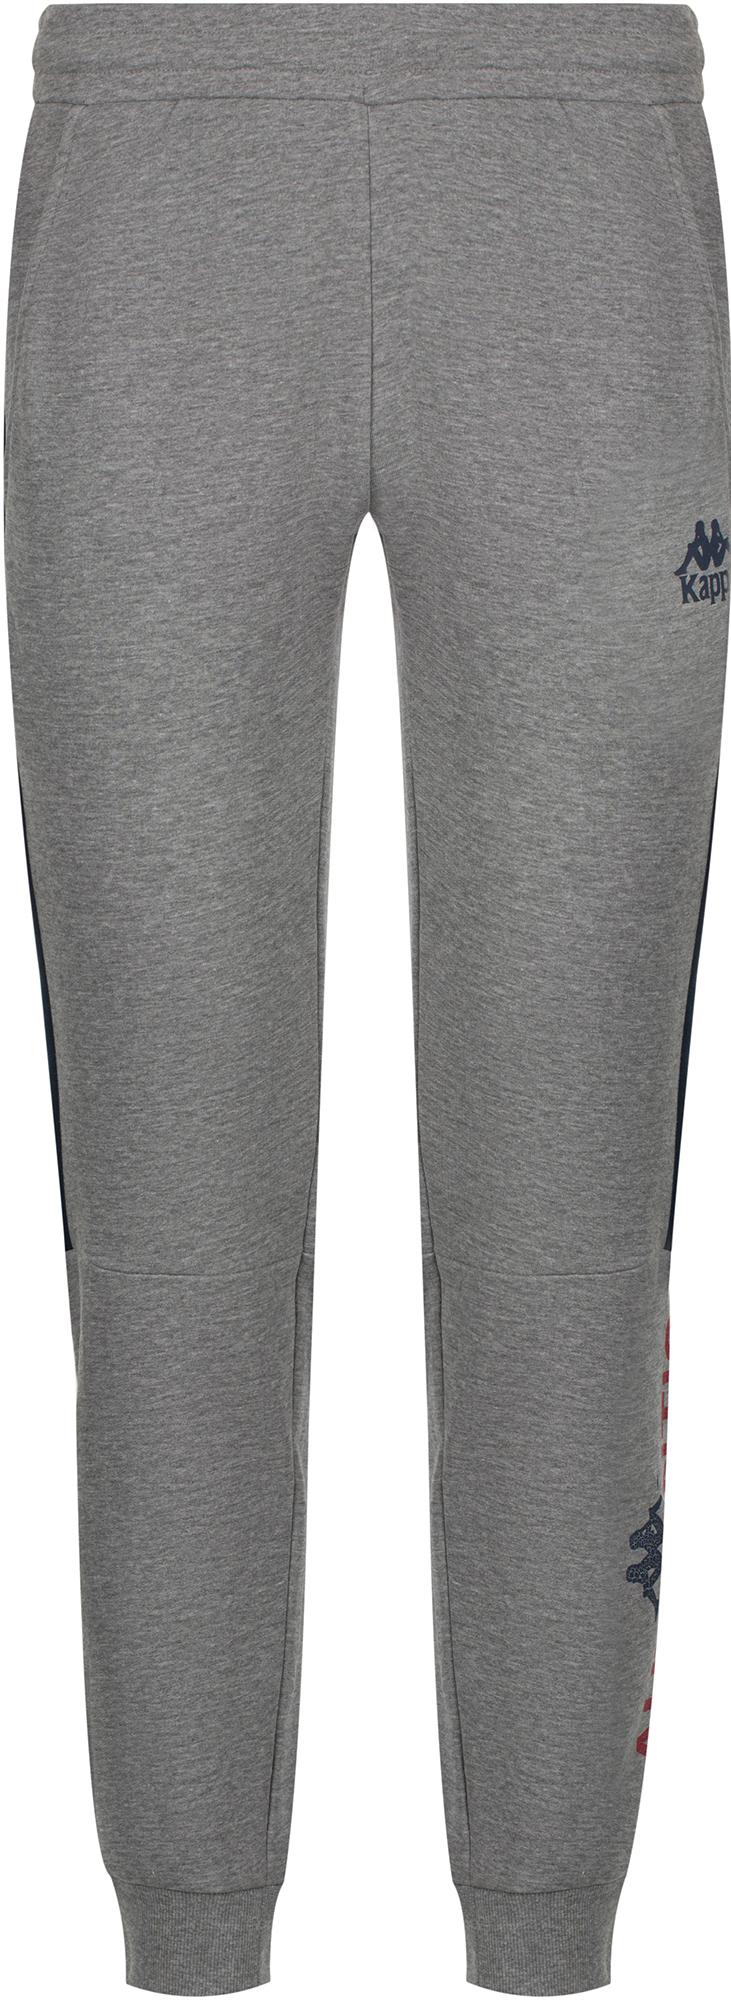 Фото - Kappa Брюки мужские Kappa, размер 50 брюки мужские kappa men s trousers цвет графитовый 304jr00 3a размер xl 52